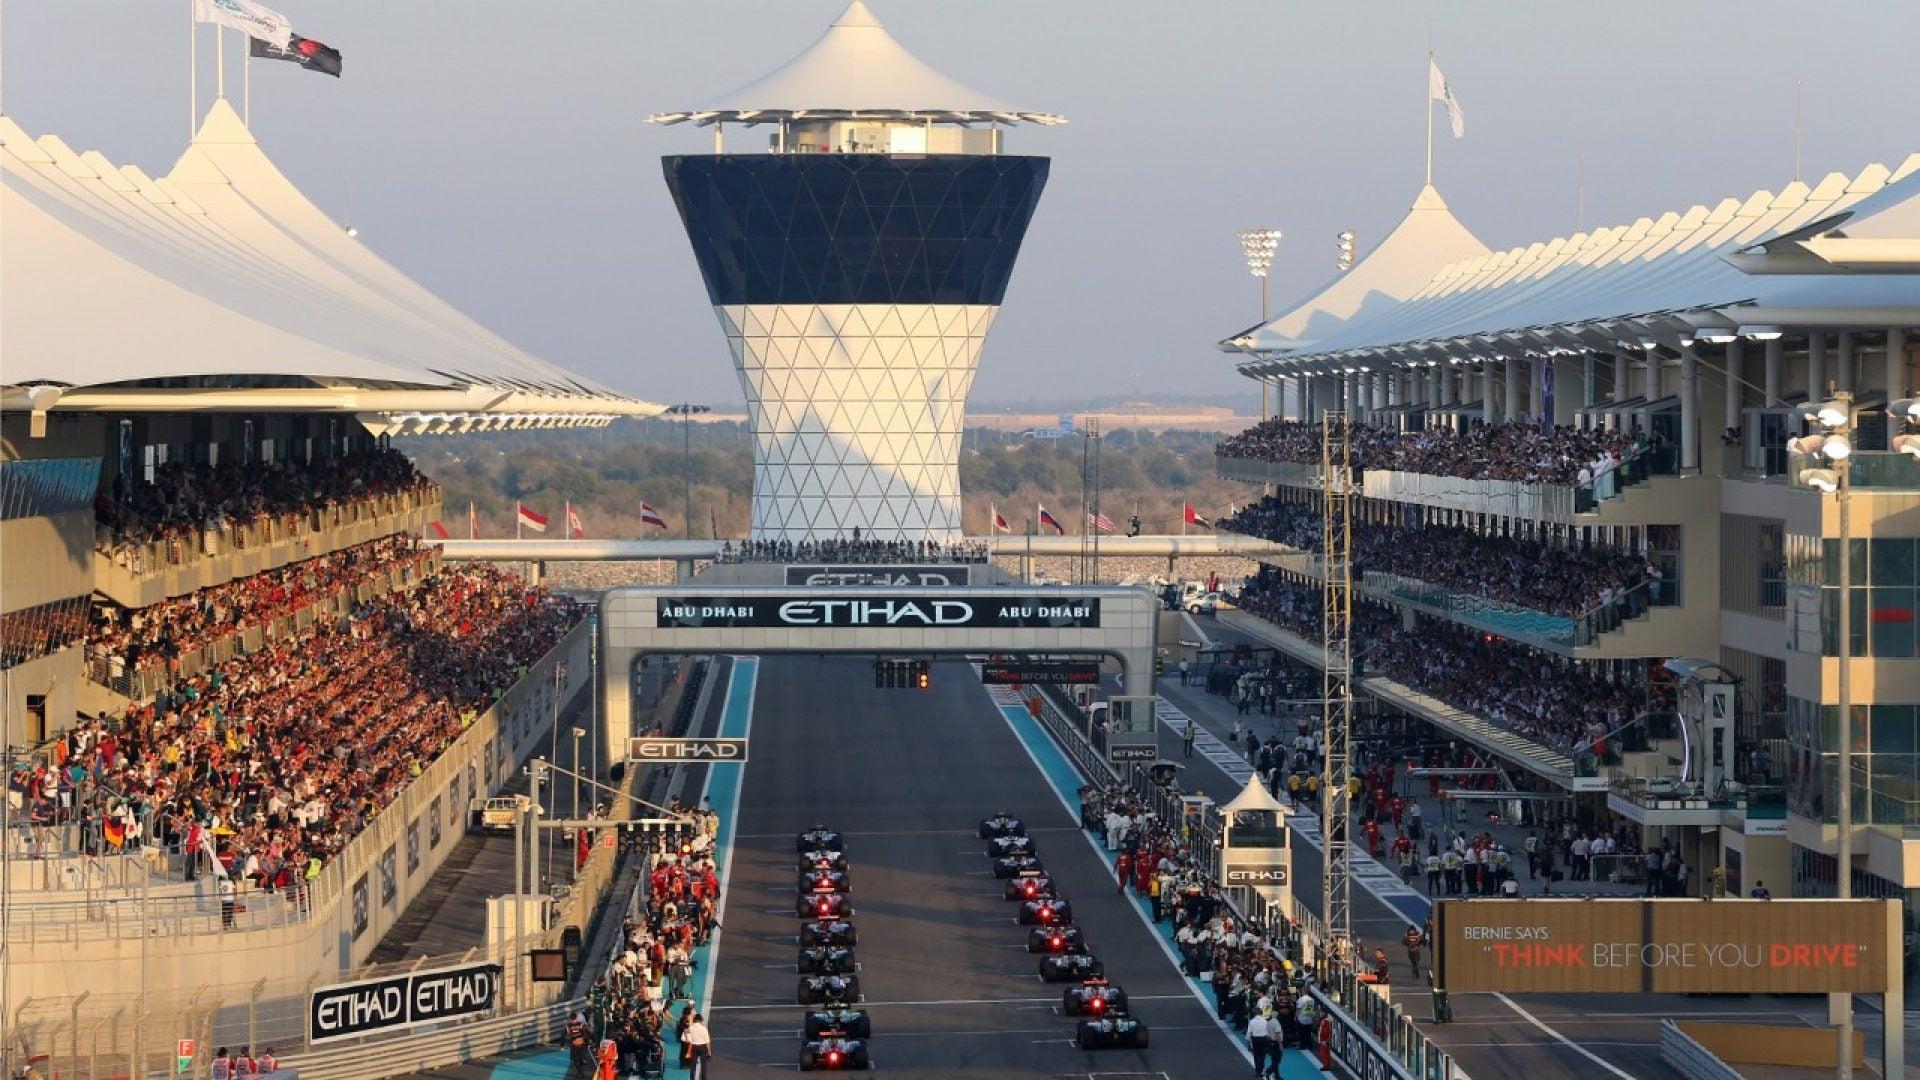 Abu Dhabi Grand Prix 2017 Live Stream How To Watch Abu